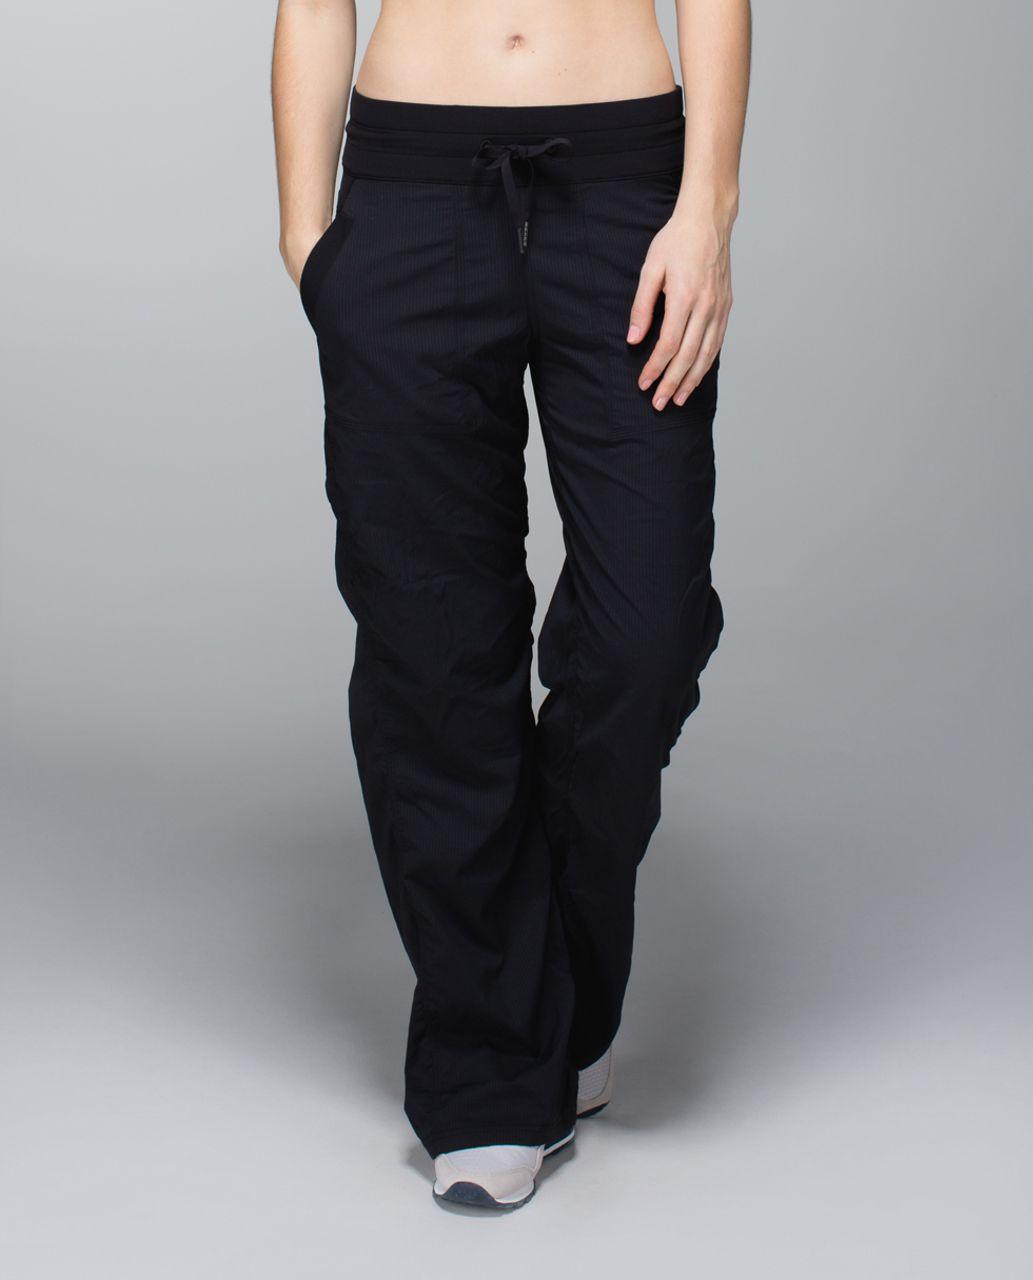 Lululemon Studio Pant II*No Liner - Black